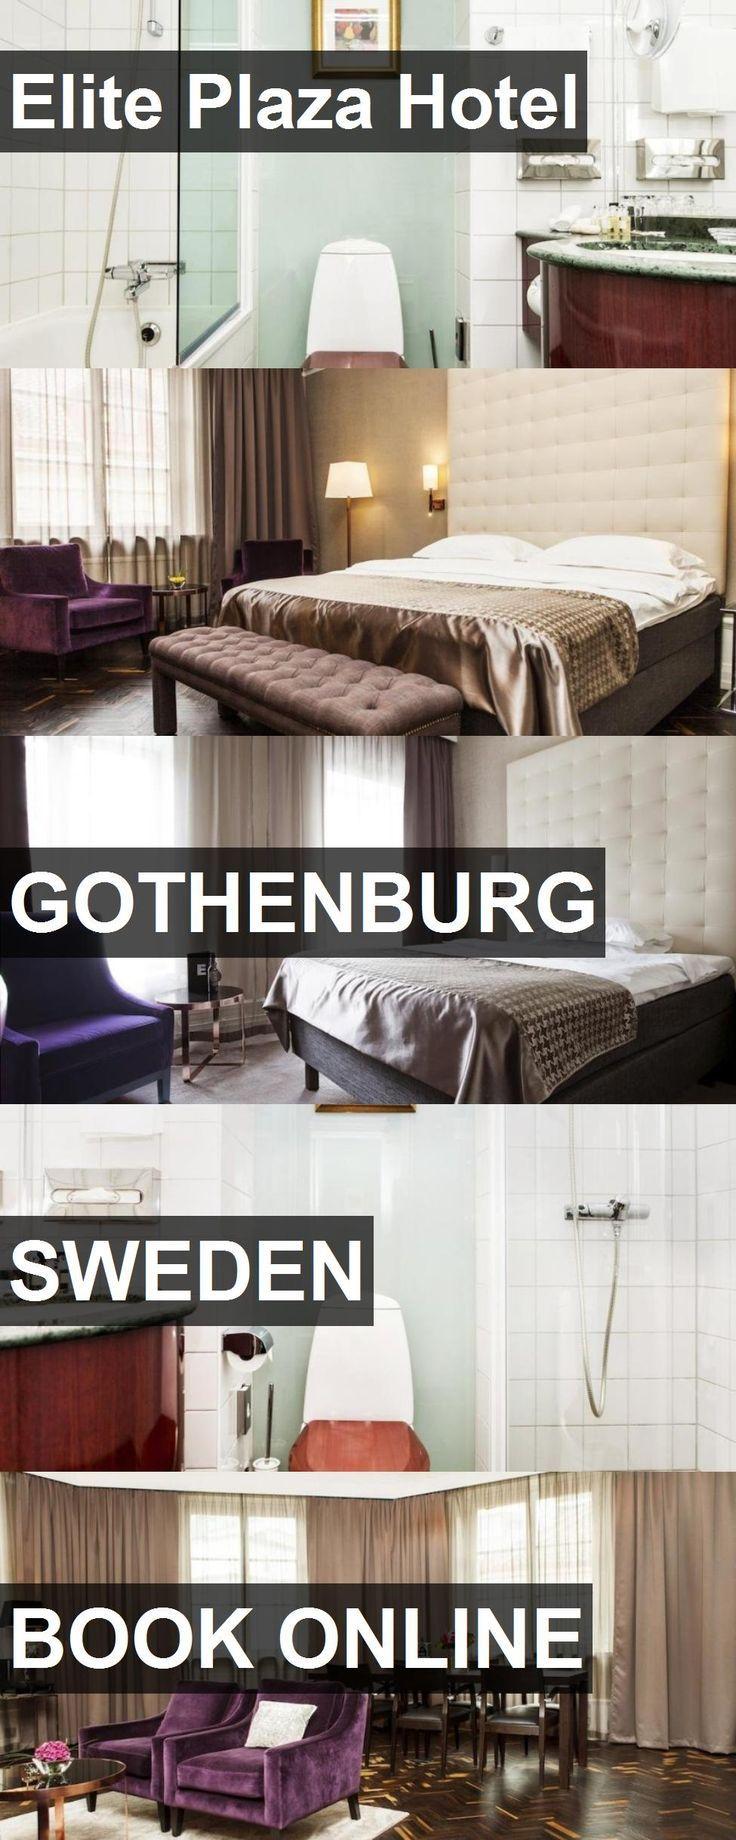 Hotel Elite Plaza Hotel in Gothenburg, Sweden. For…